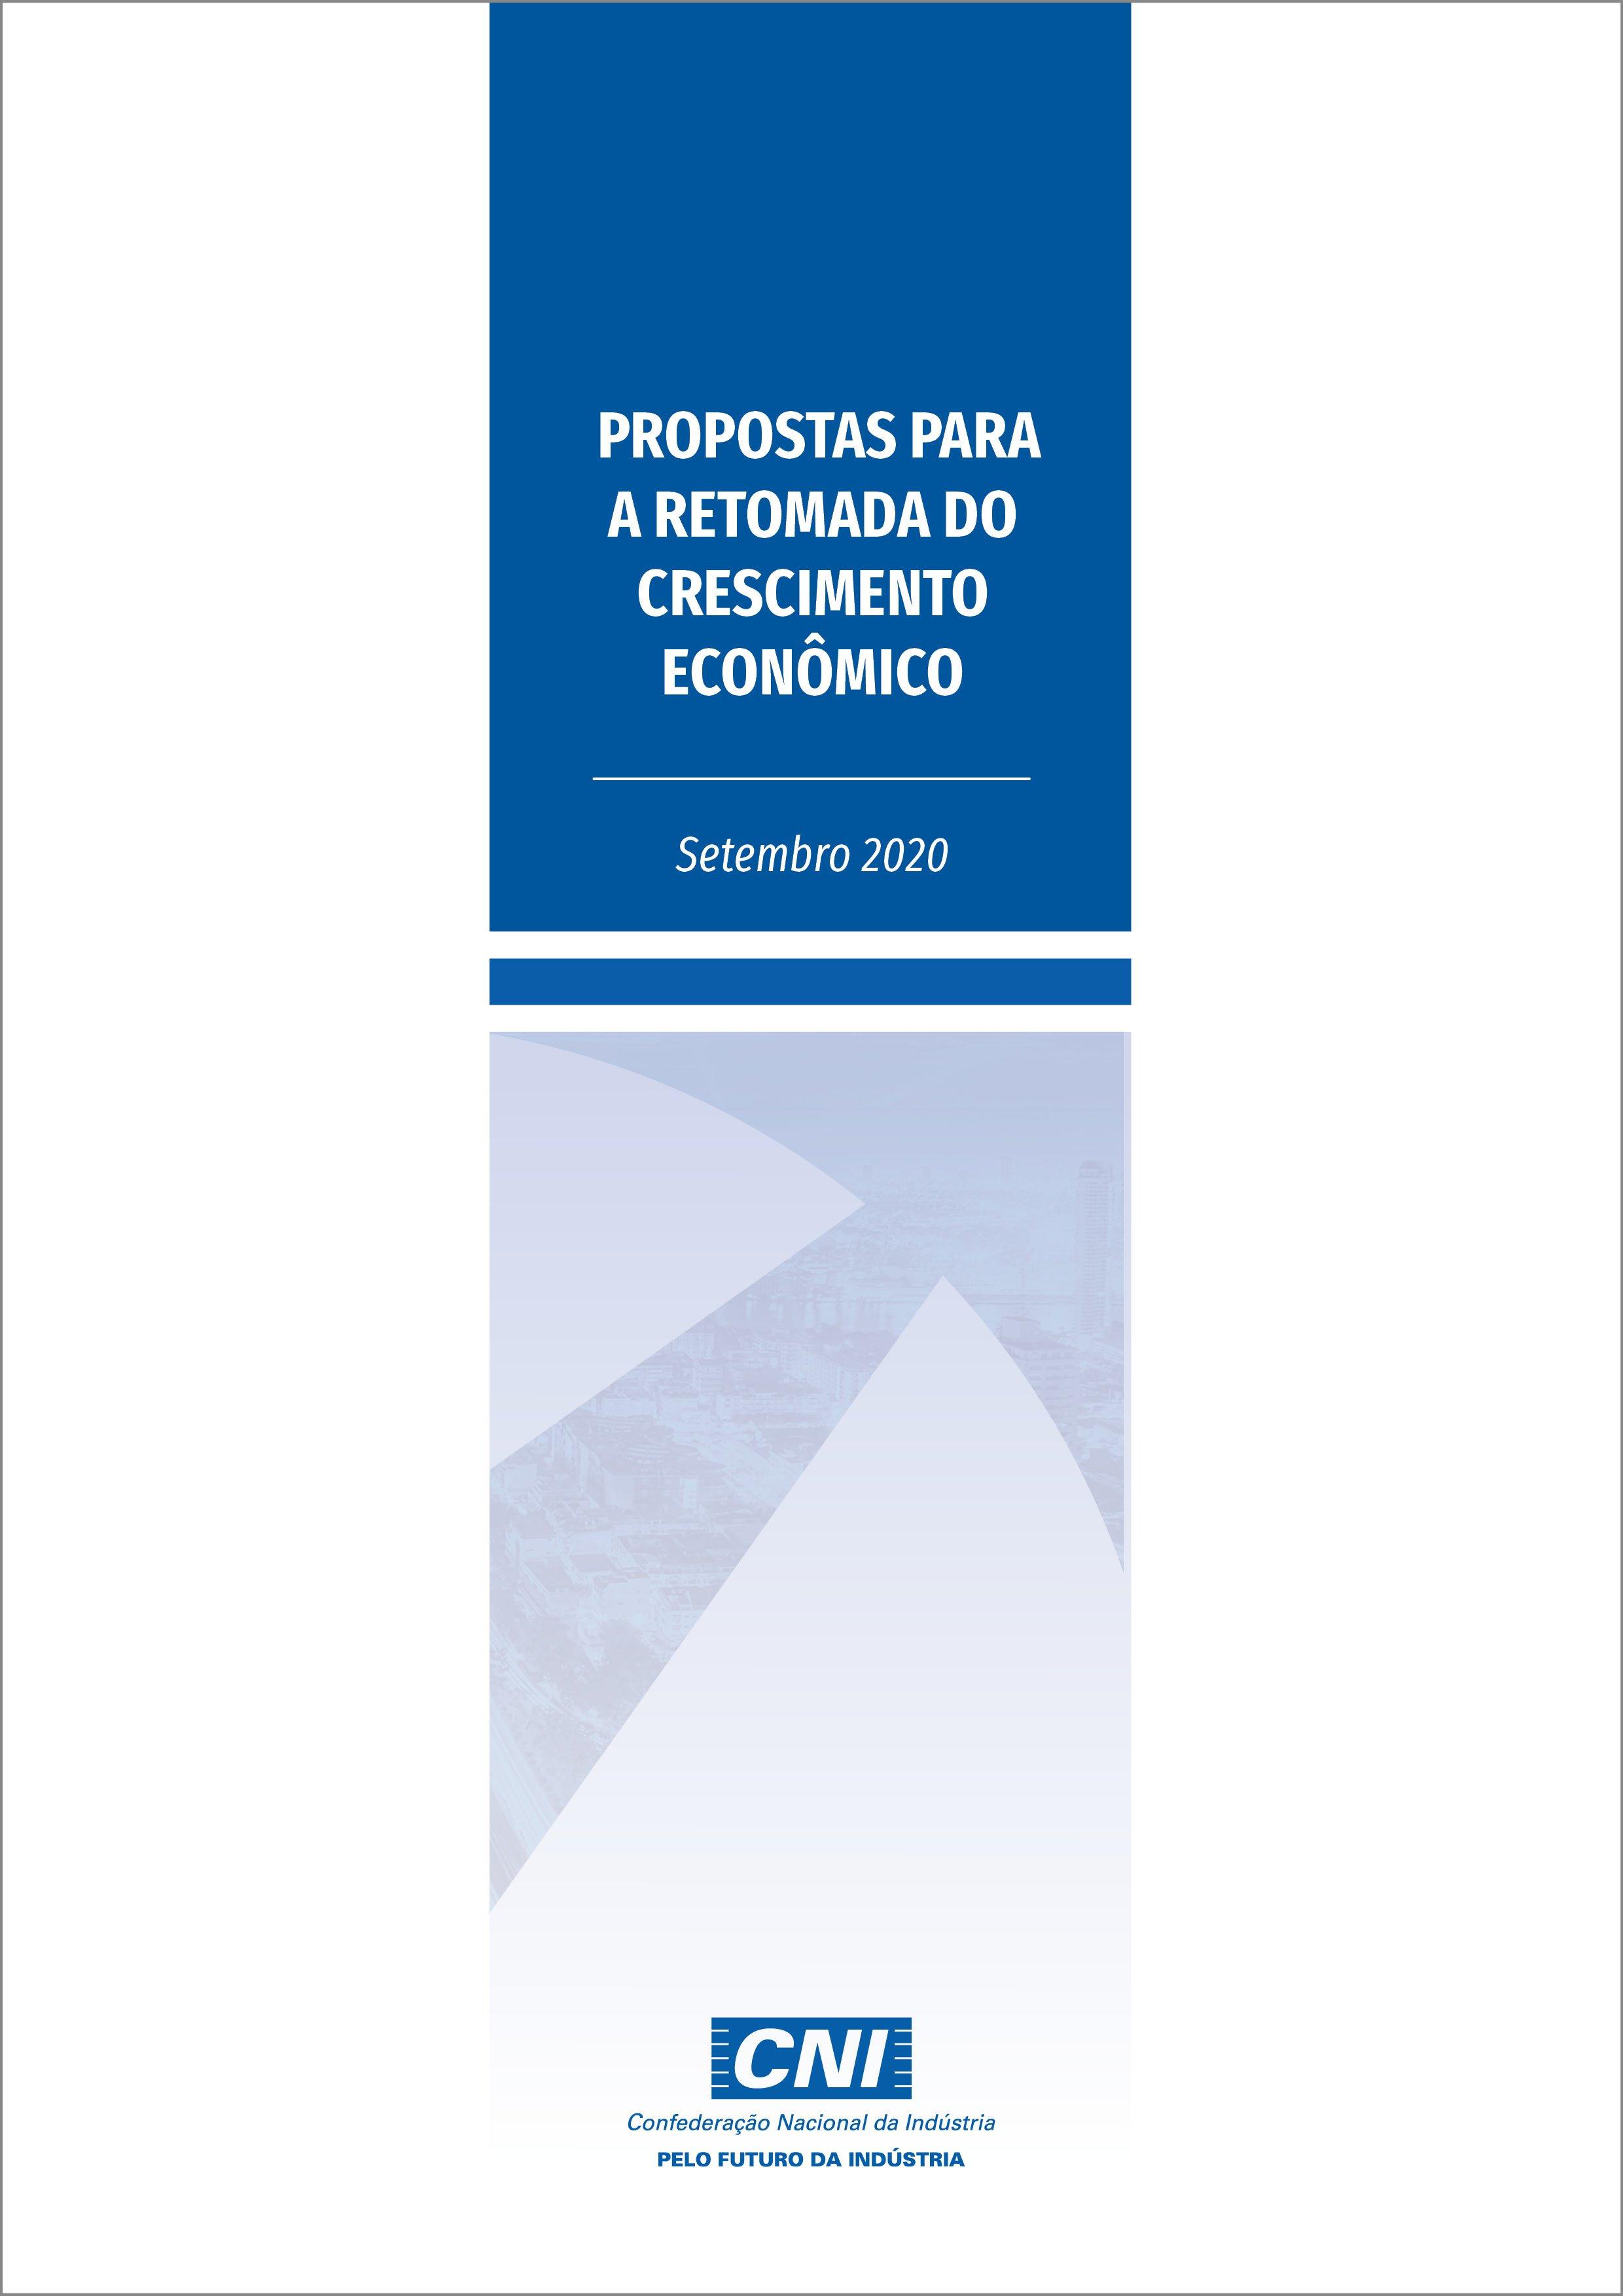 Propostas_retomada_cresc_econ_capa_3.jpg